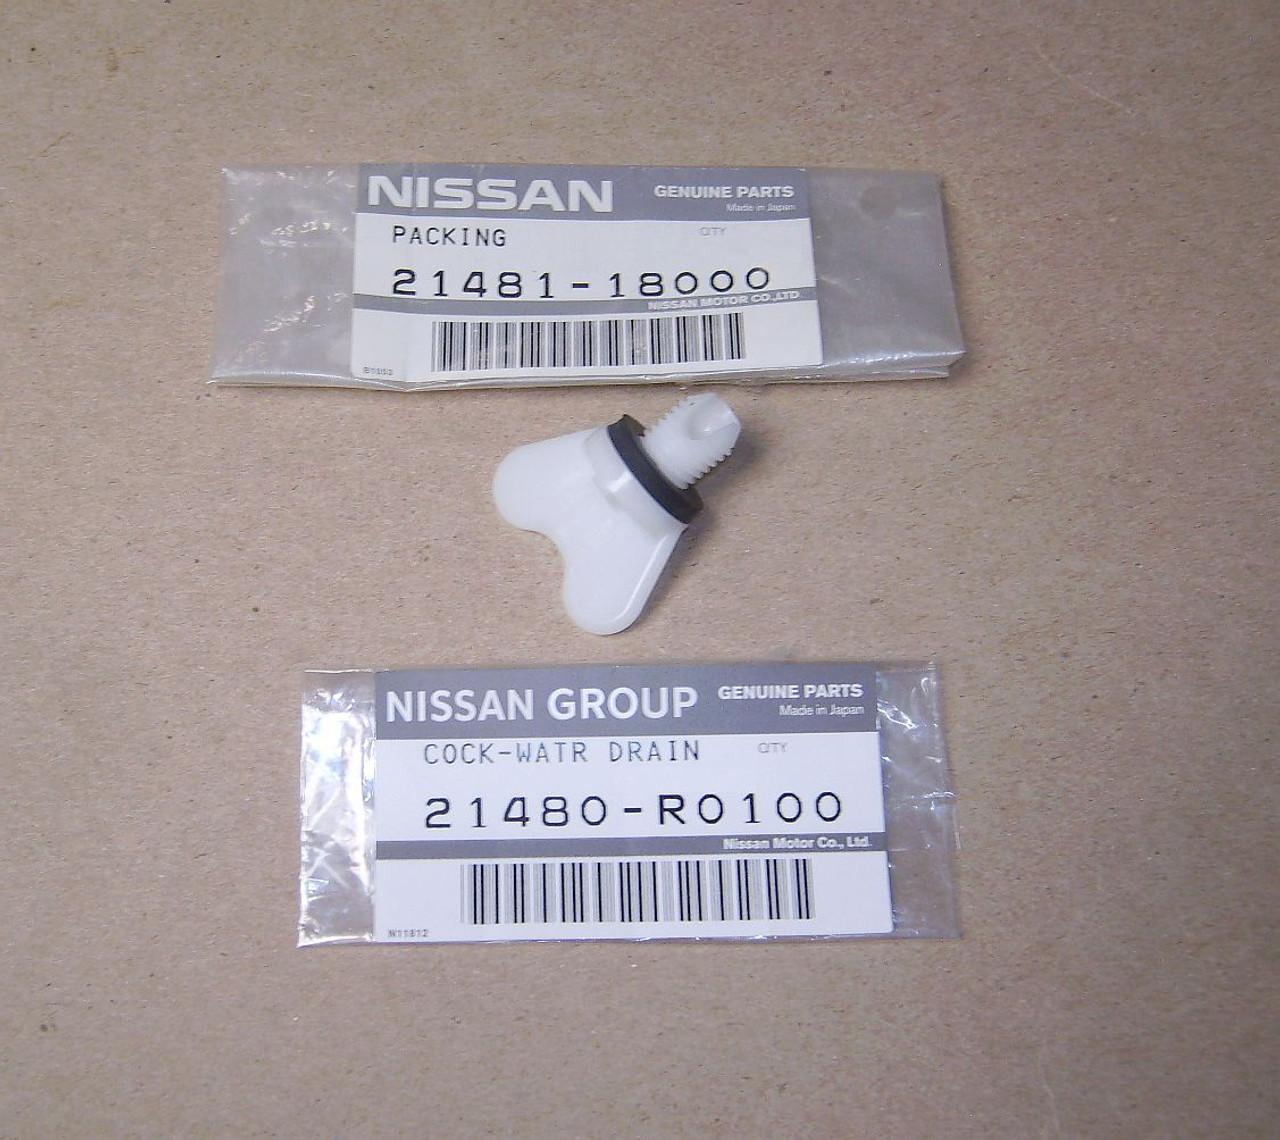 21480-R0100